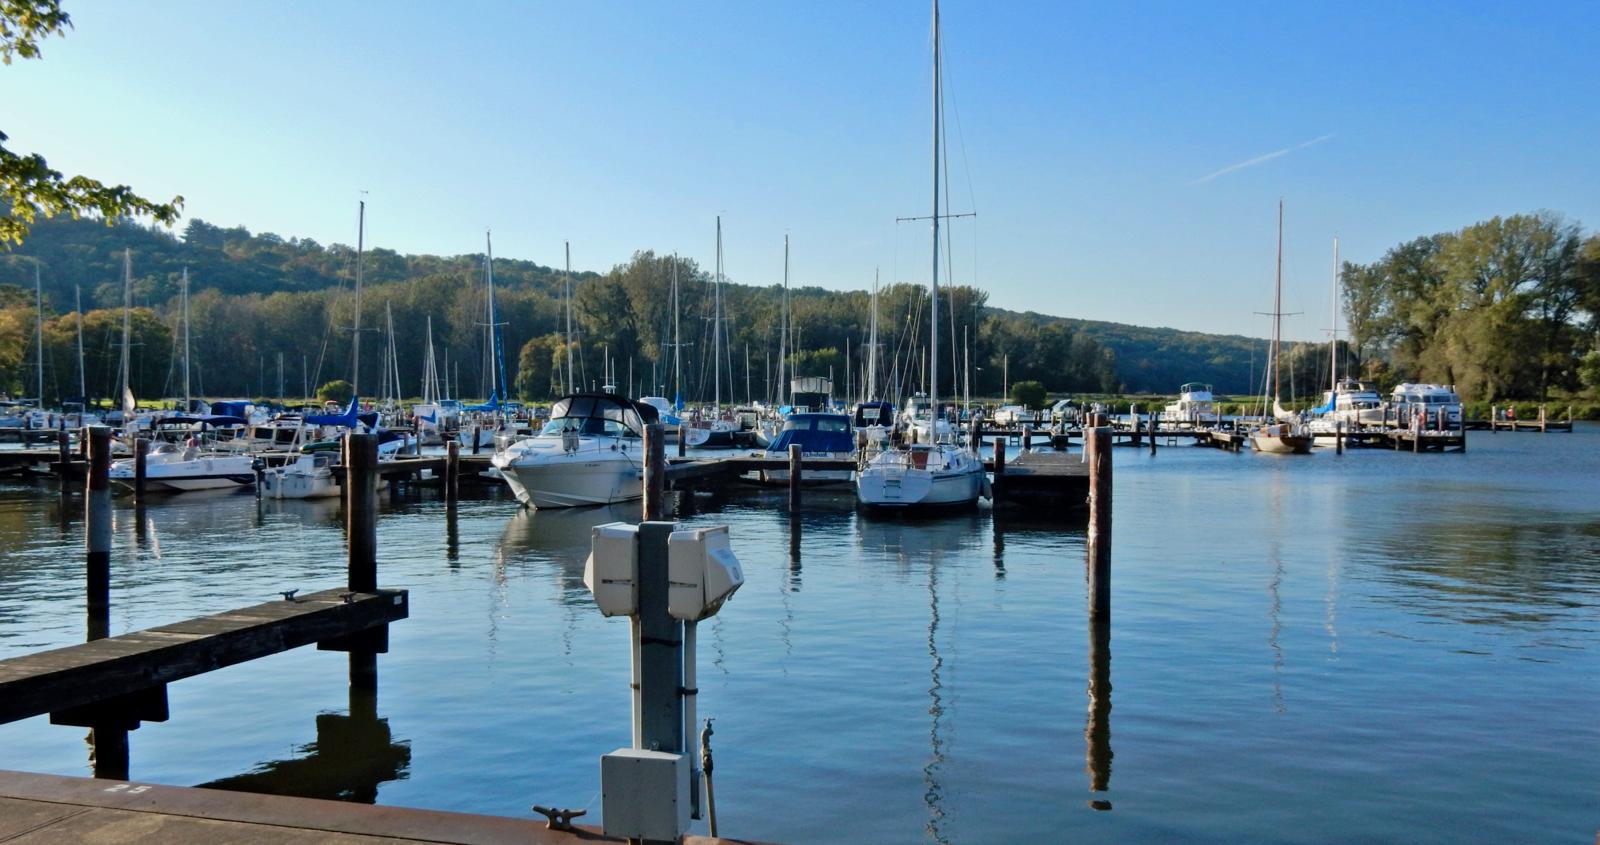 Allan-H.-Treman-State-Marine-Park-Ithaca-NY.jpg